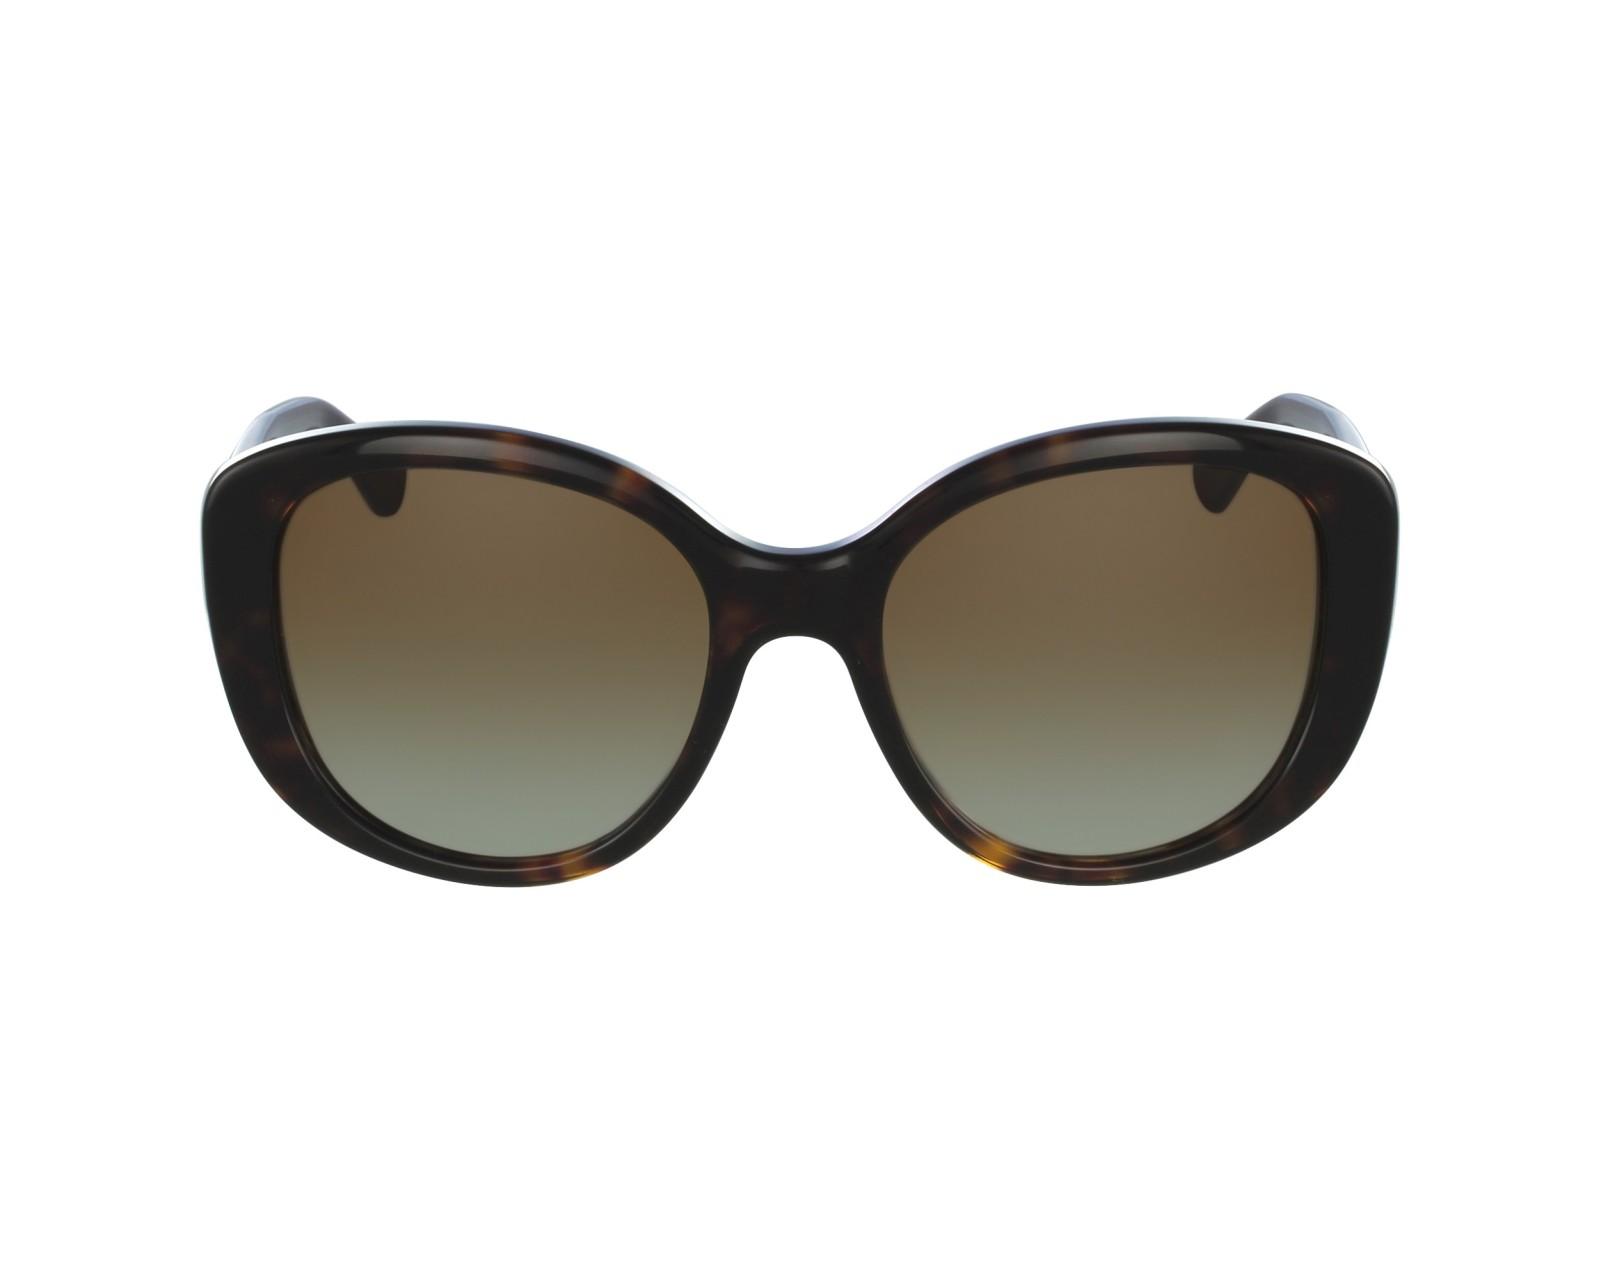 + Lunettes Dolce & Gabbana - DG4248 502/T5 PSTQ2o6